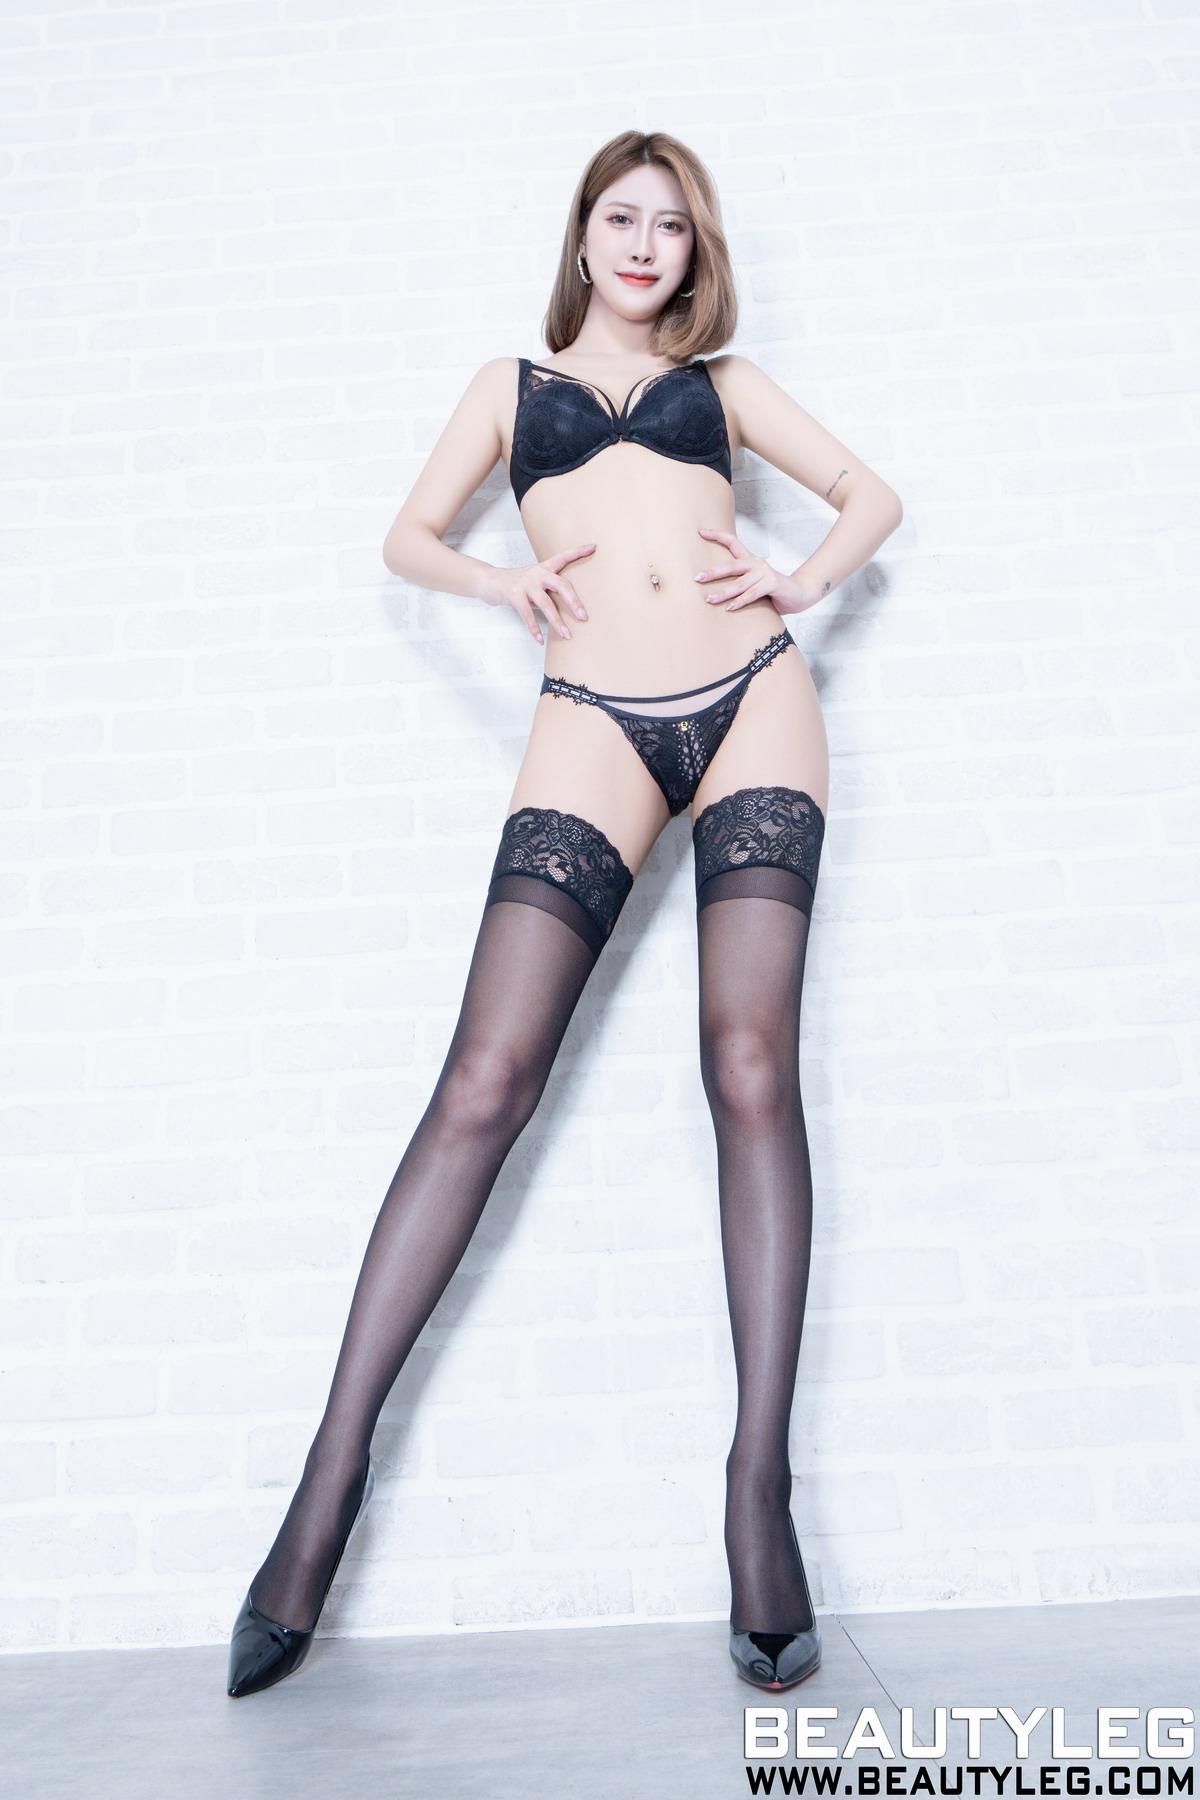 [Beautyleg]美腿写真 2020.07.01 No.1941 Amber[/509M]